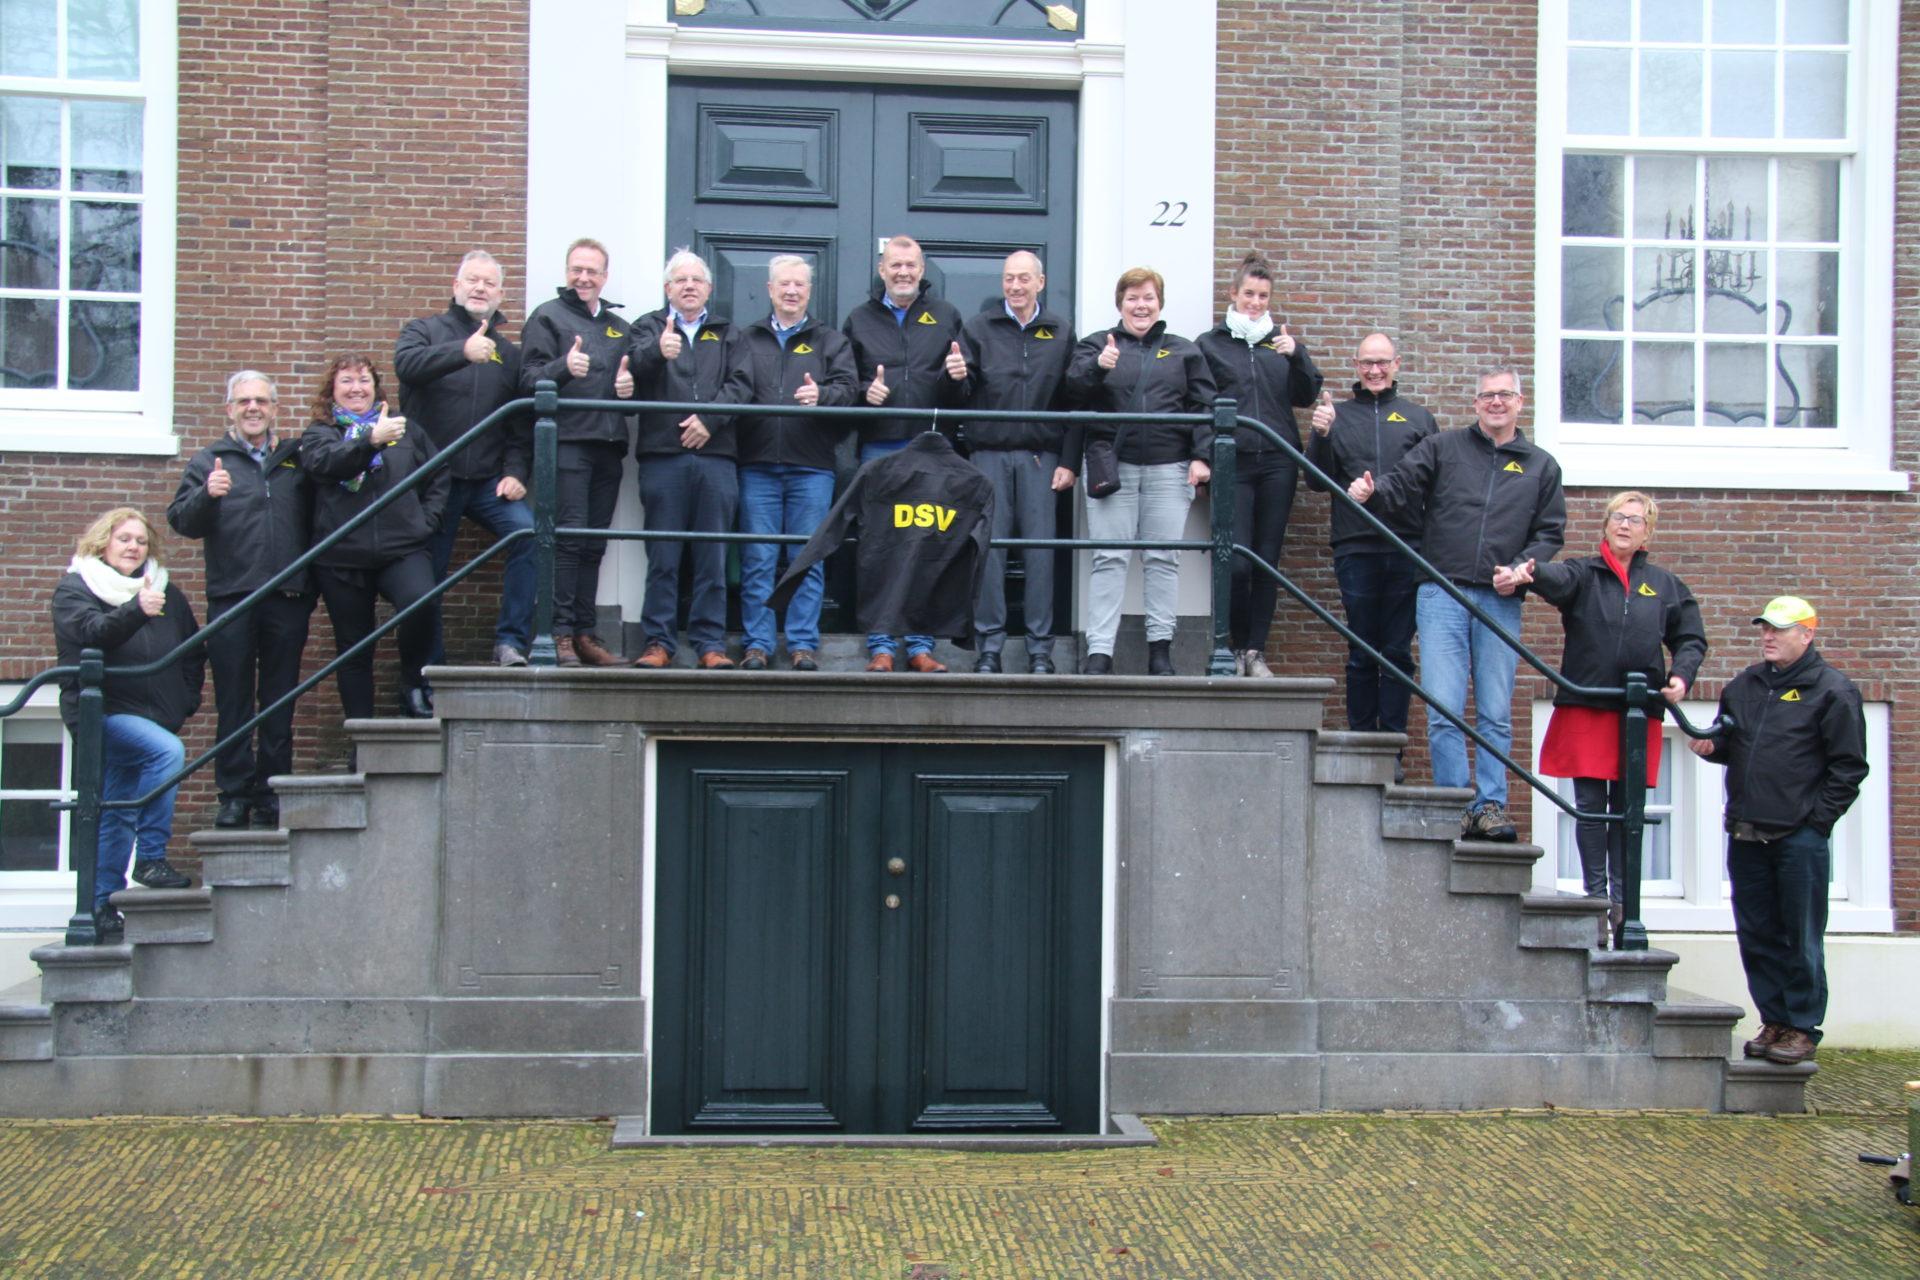 DSV Opmeer